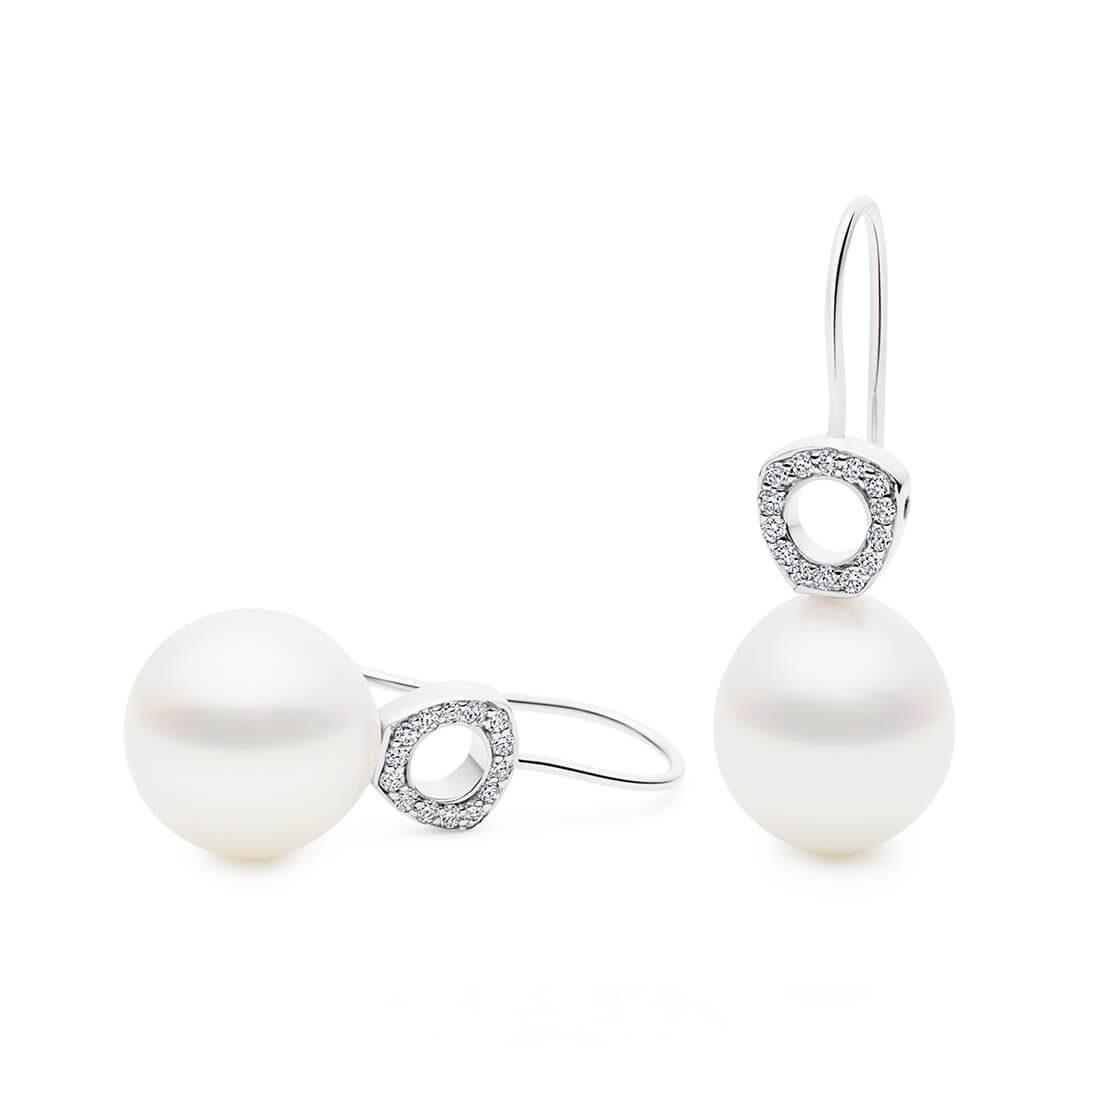 Kailis - Hope Diamond Pearl Earrings, White Gold